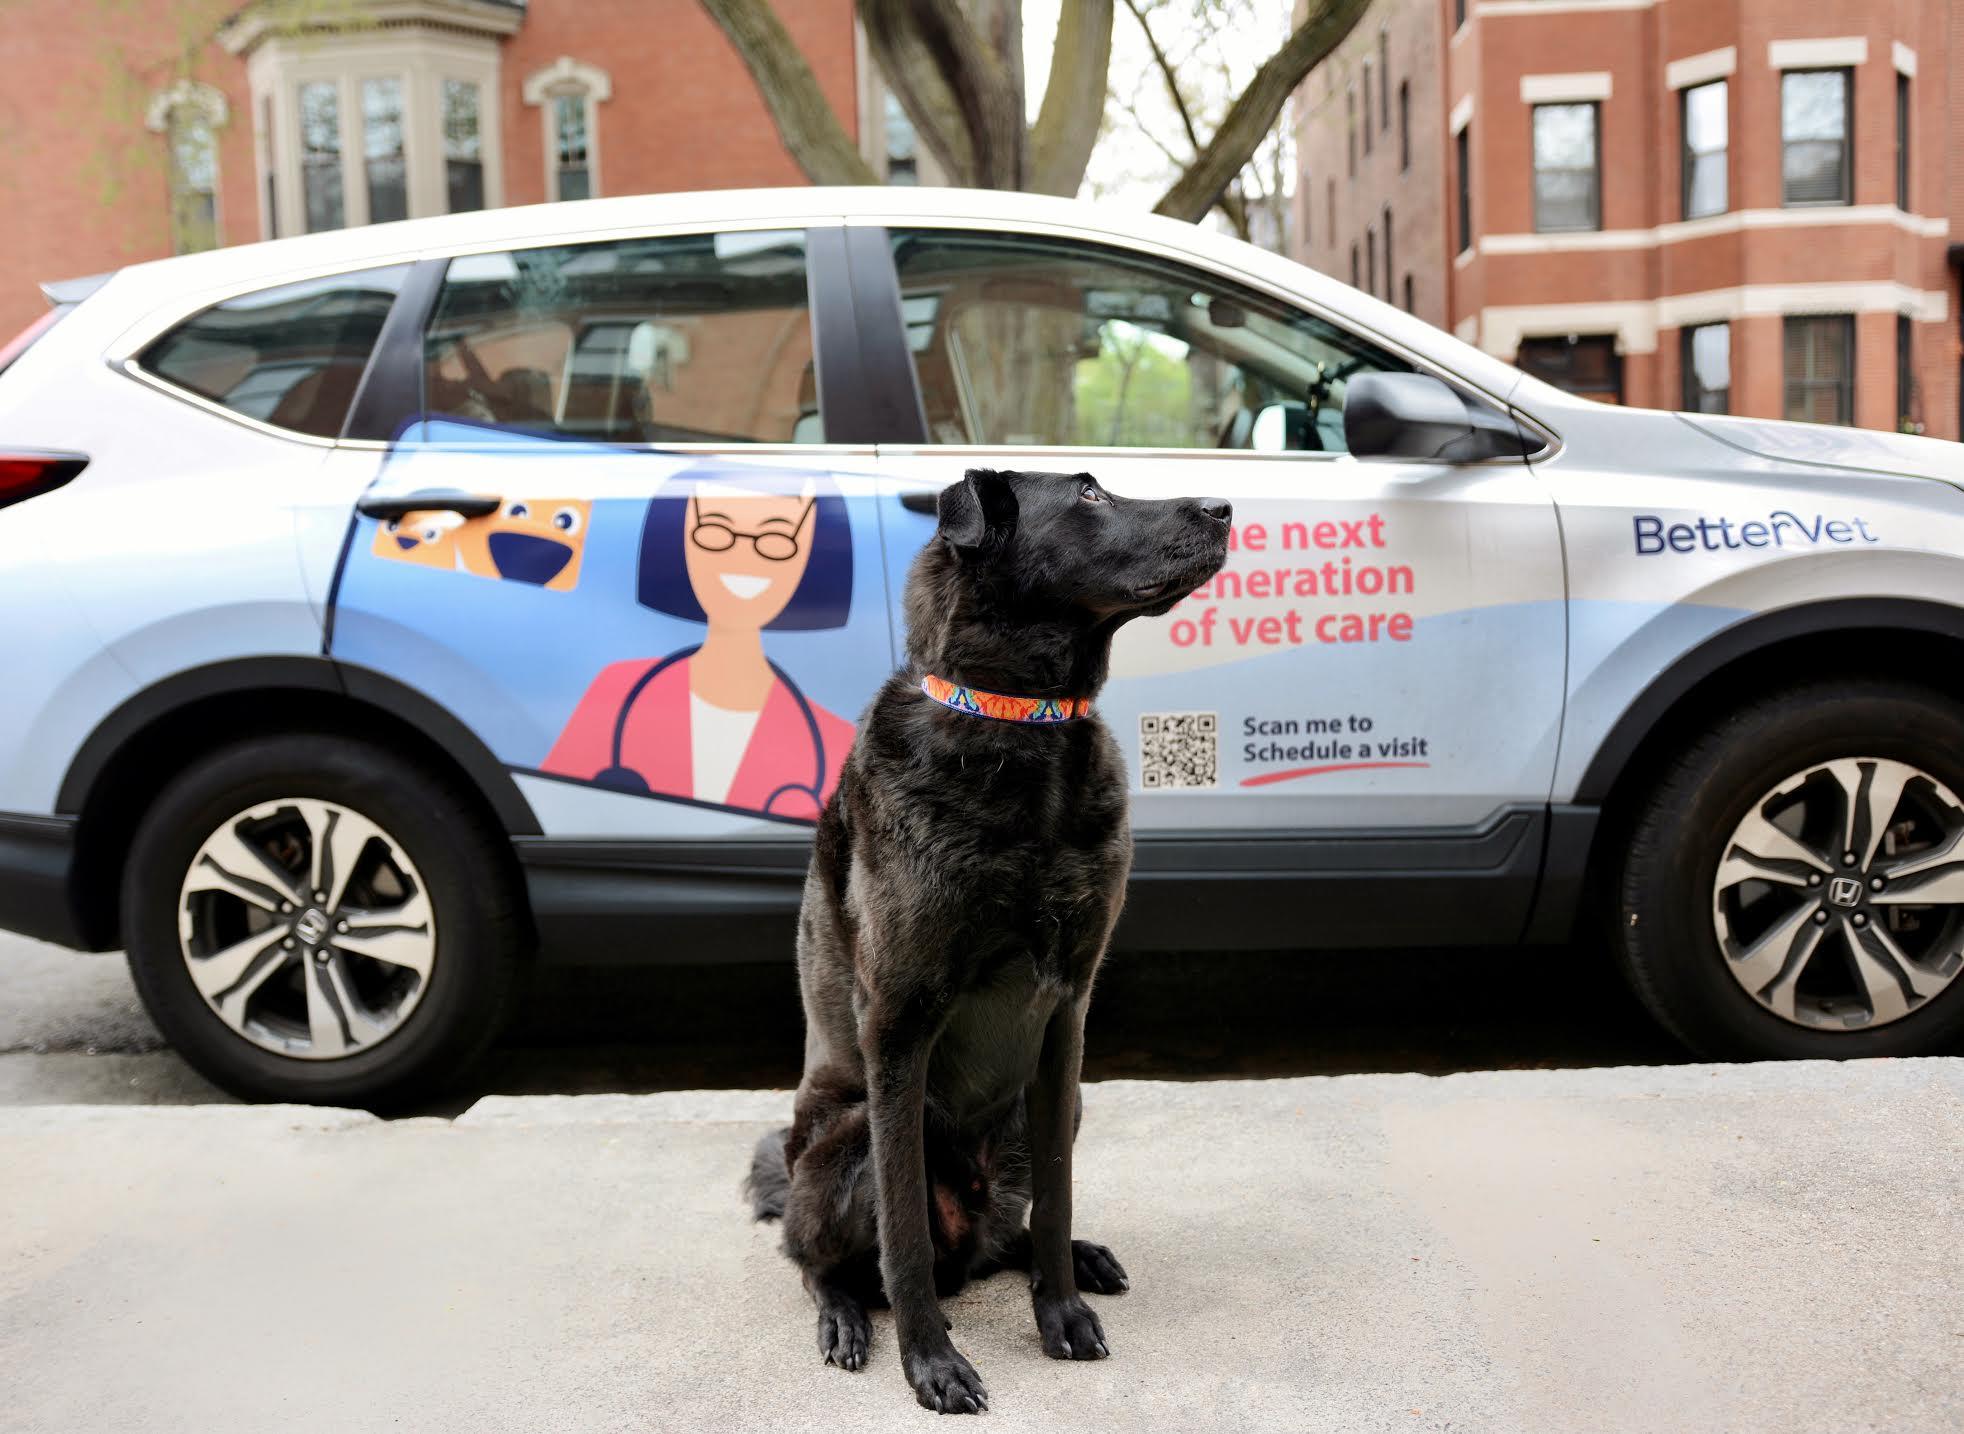 Dog sitting and BetterVet car on the background image.